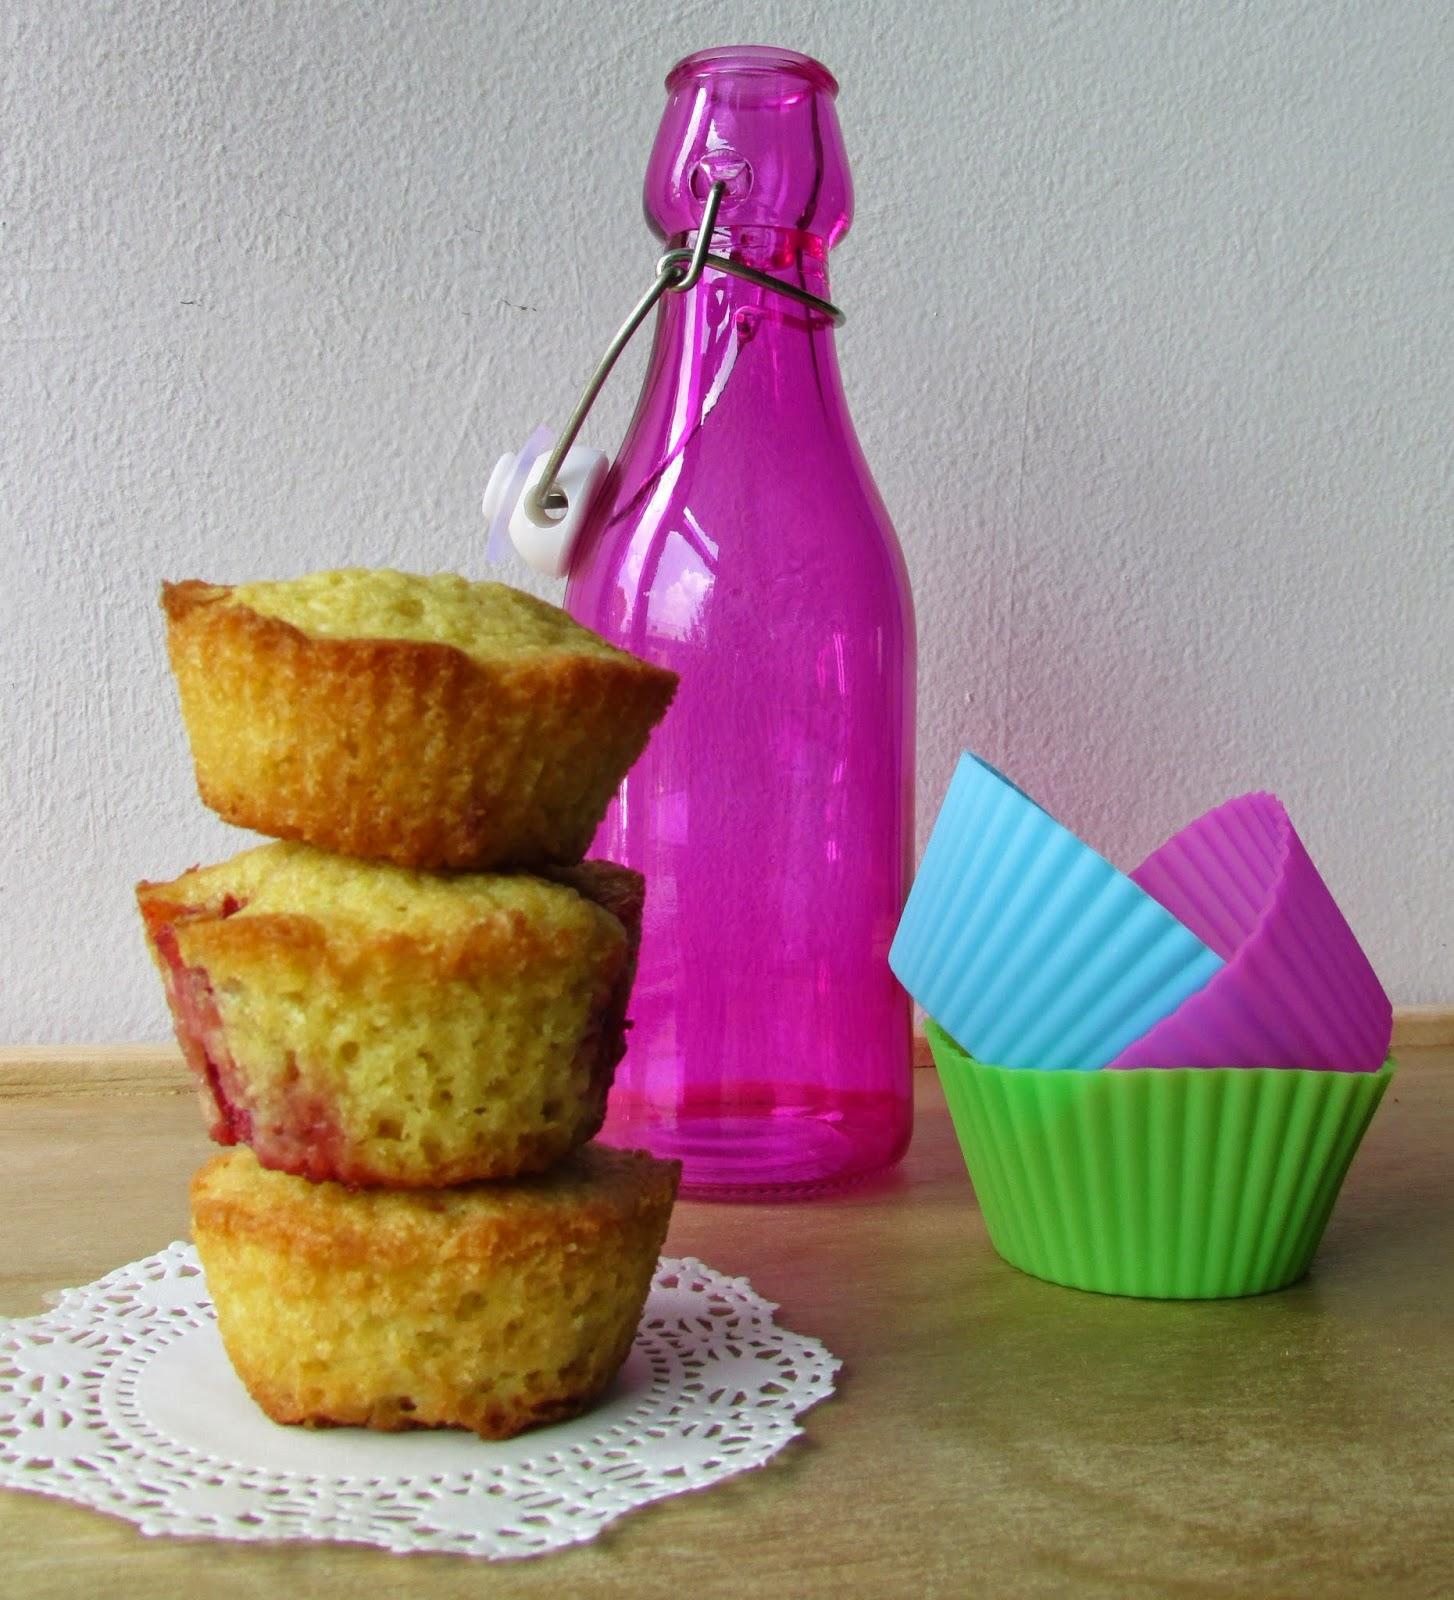 receta-niños-fresa-niño-panques-mexico-df-cupcakes